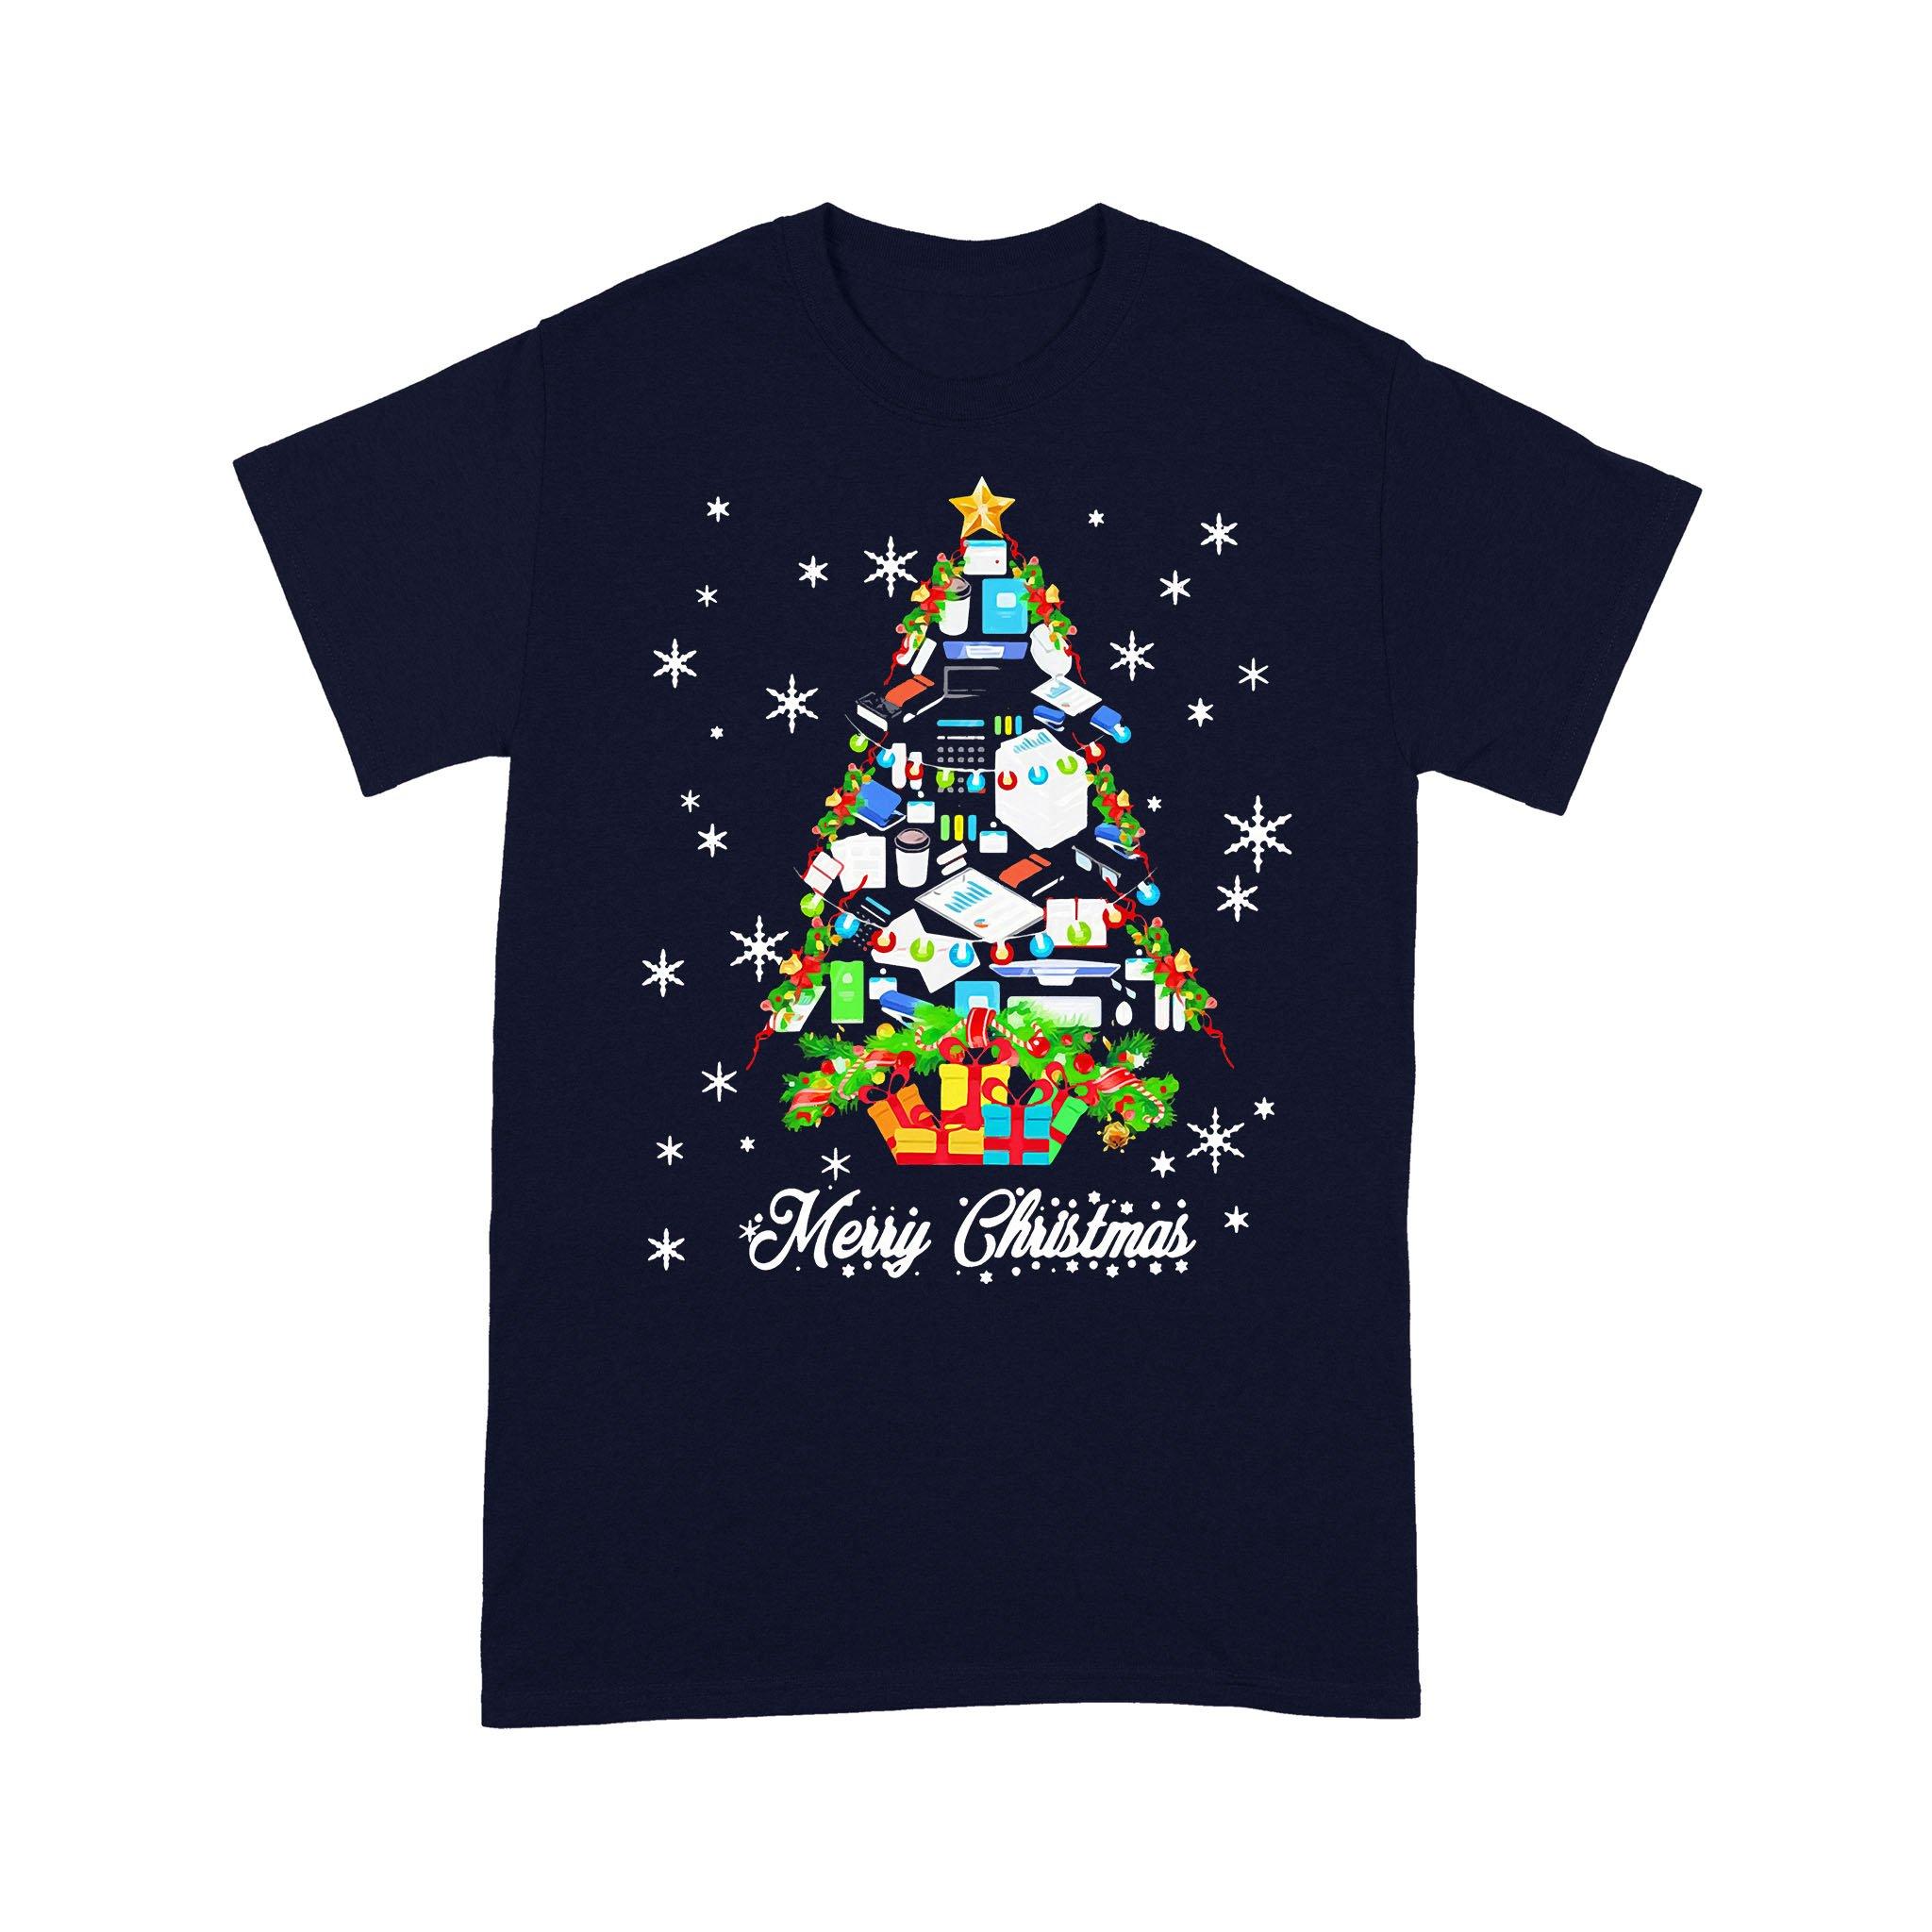 Accountant Merry Christmas T-shirt